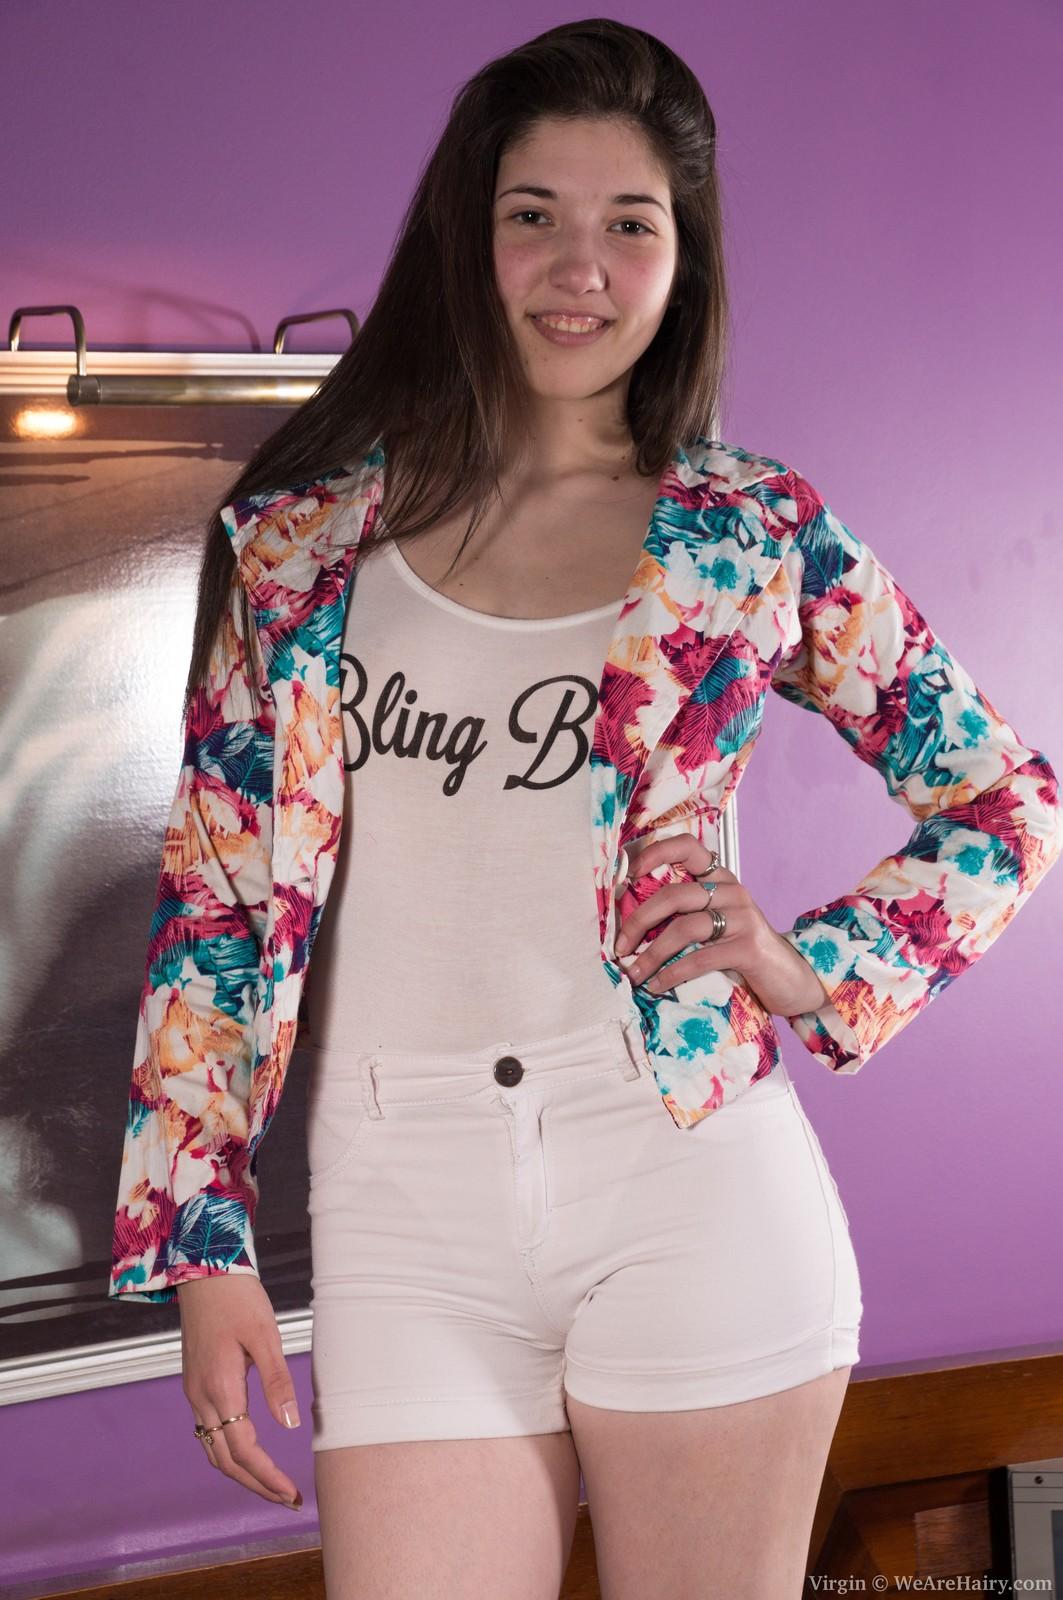 Puzzy girl virgin American teen